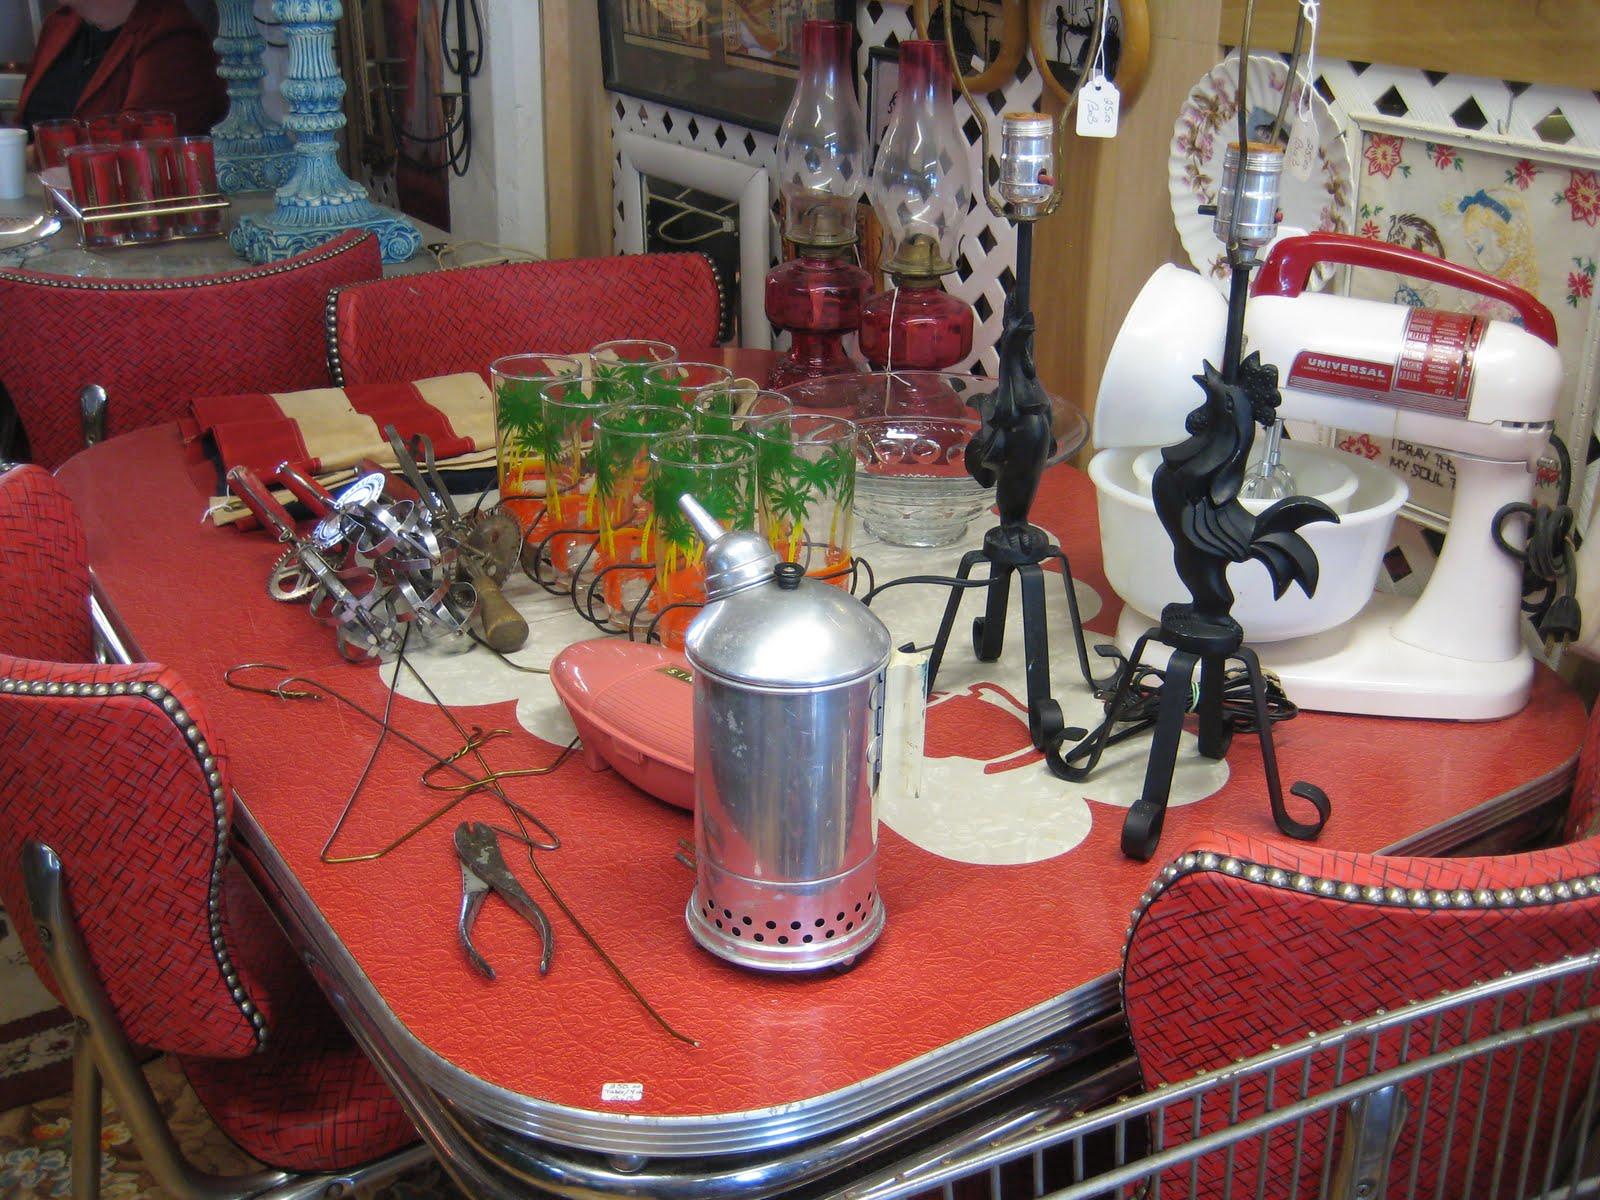 c dianne zweig  kitsch 'n stuff 1950s formica and